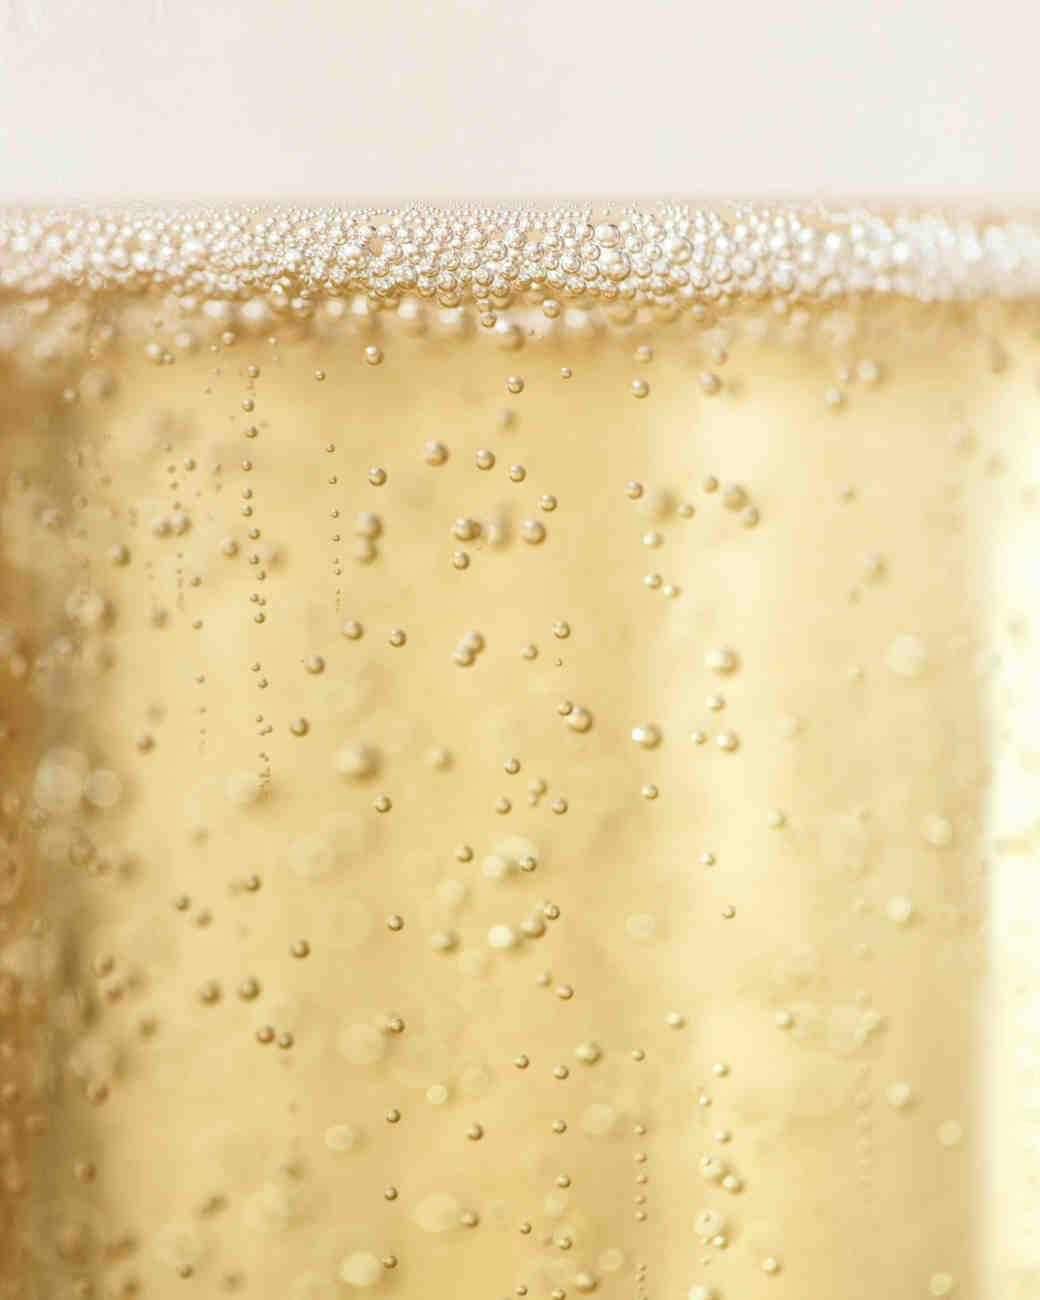 champagne-bubbles-mwd107933.jpg